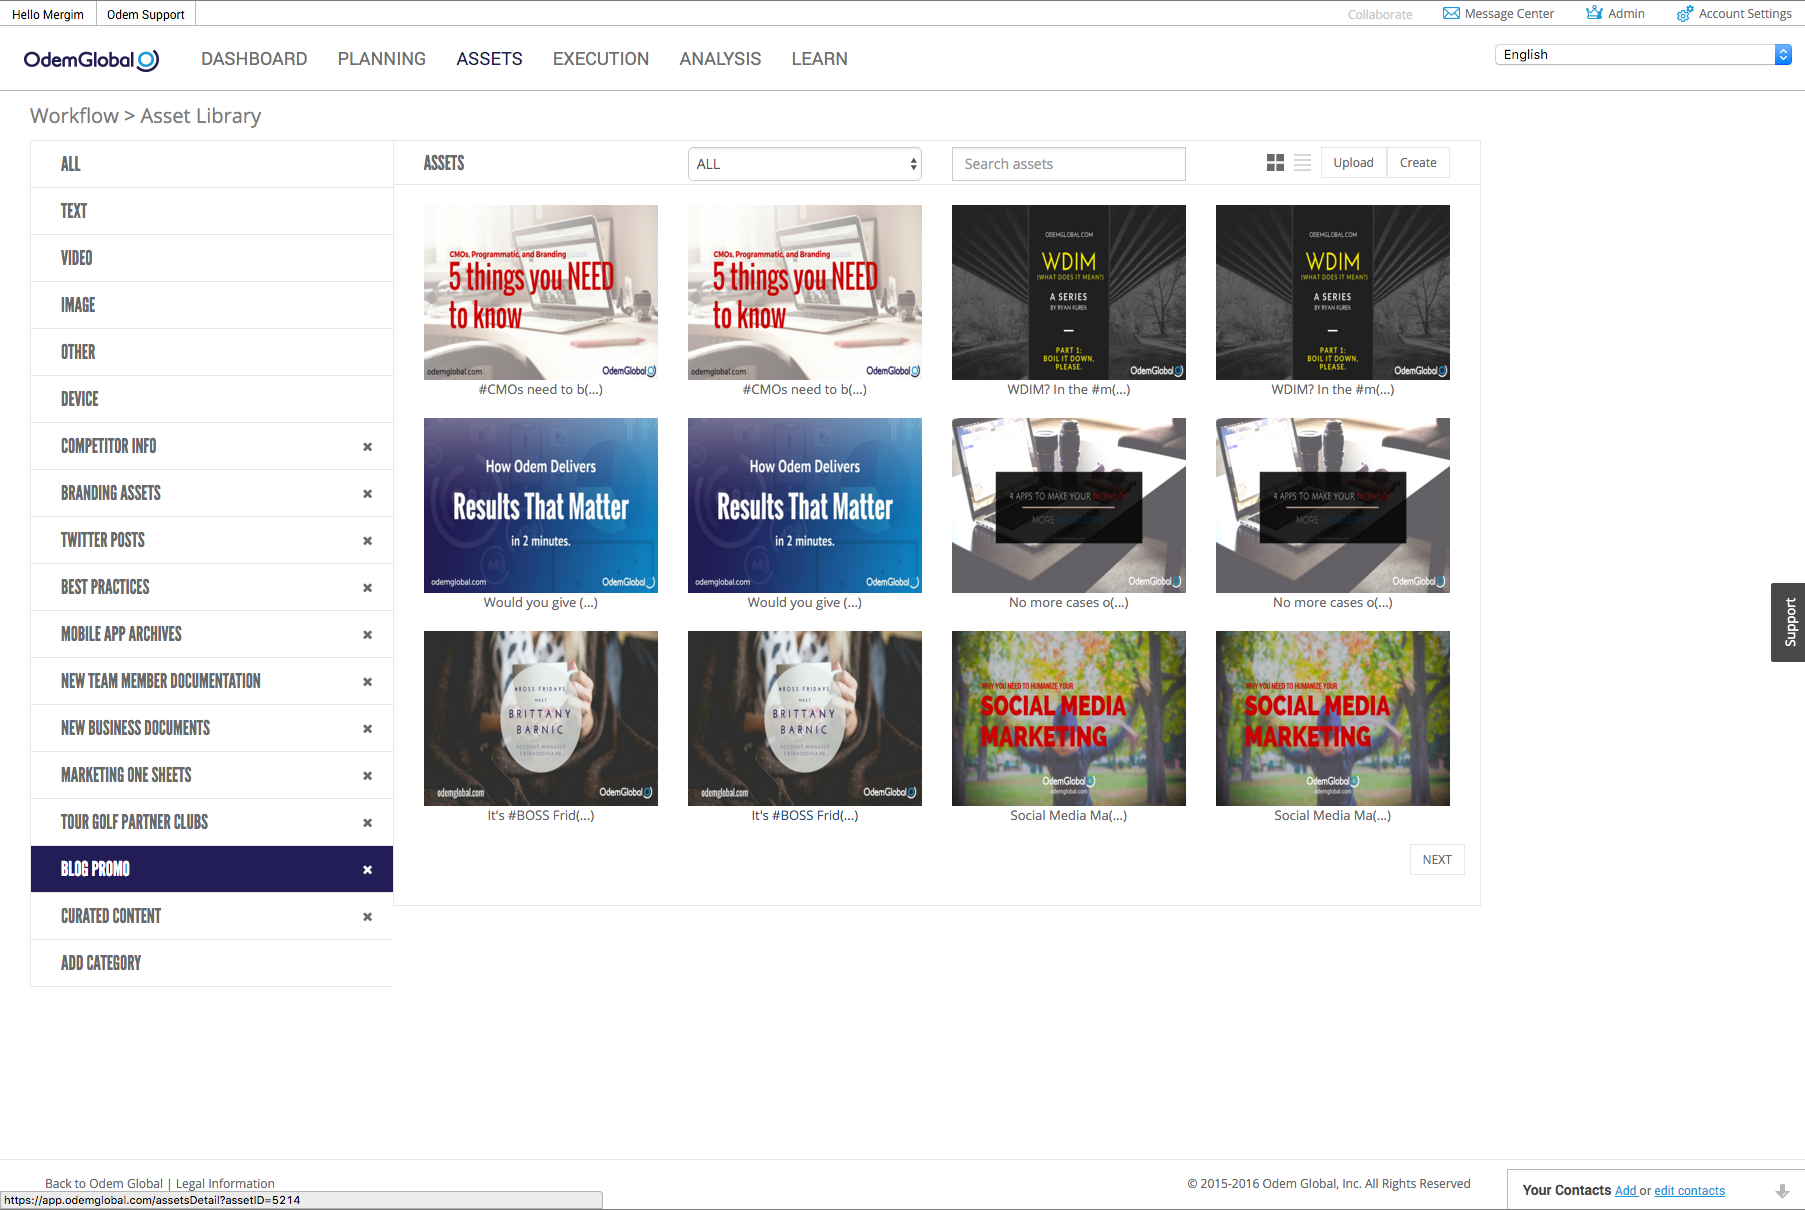 odem all-in-one marketing dashboard